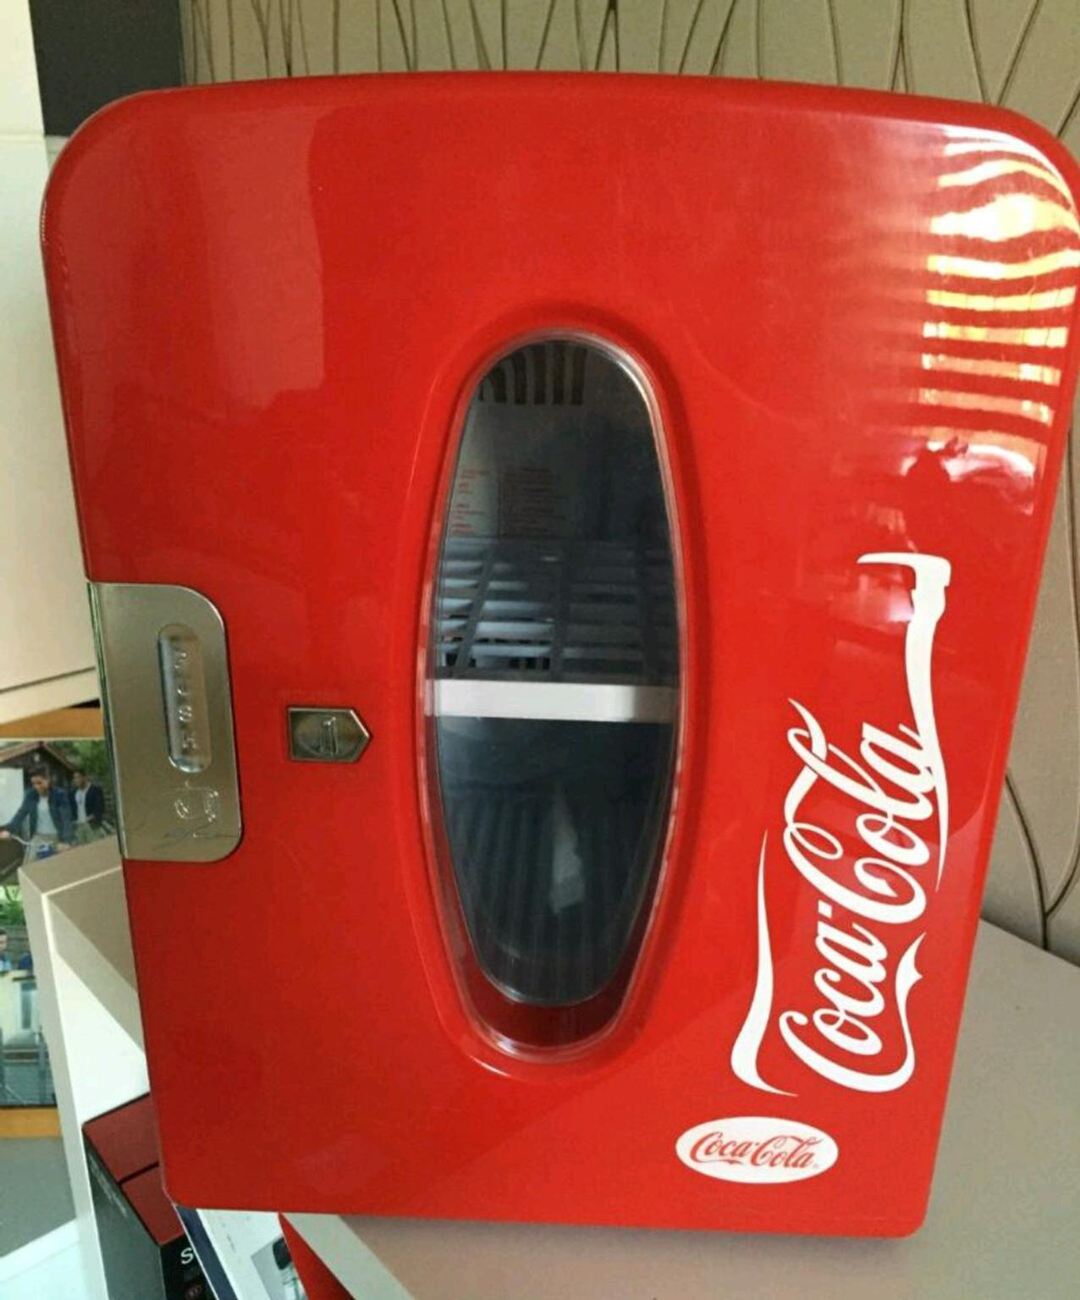 Minibar Kühlschrank Coca Cola : Gebraucht minibar mini kühlschrank coca cola in köln um